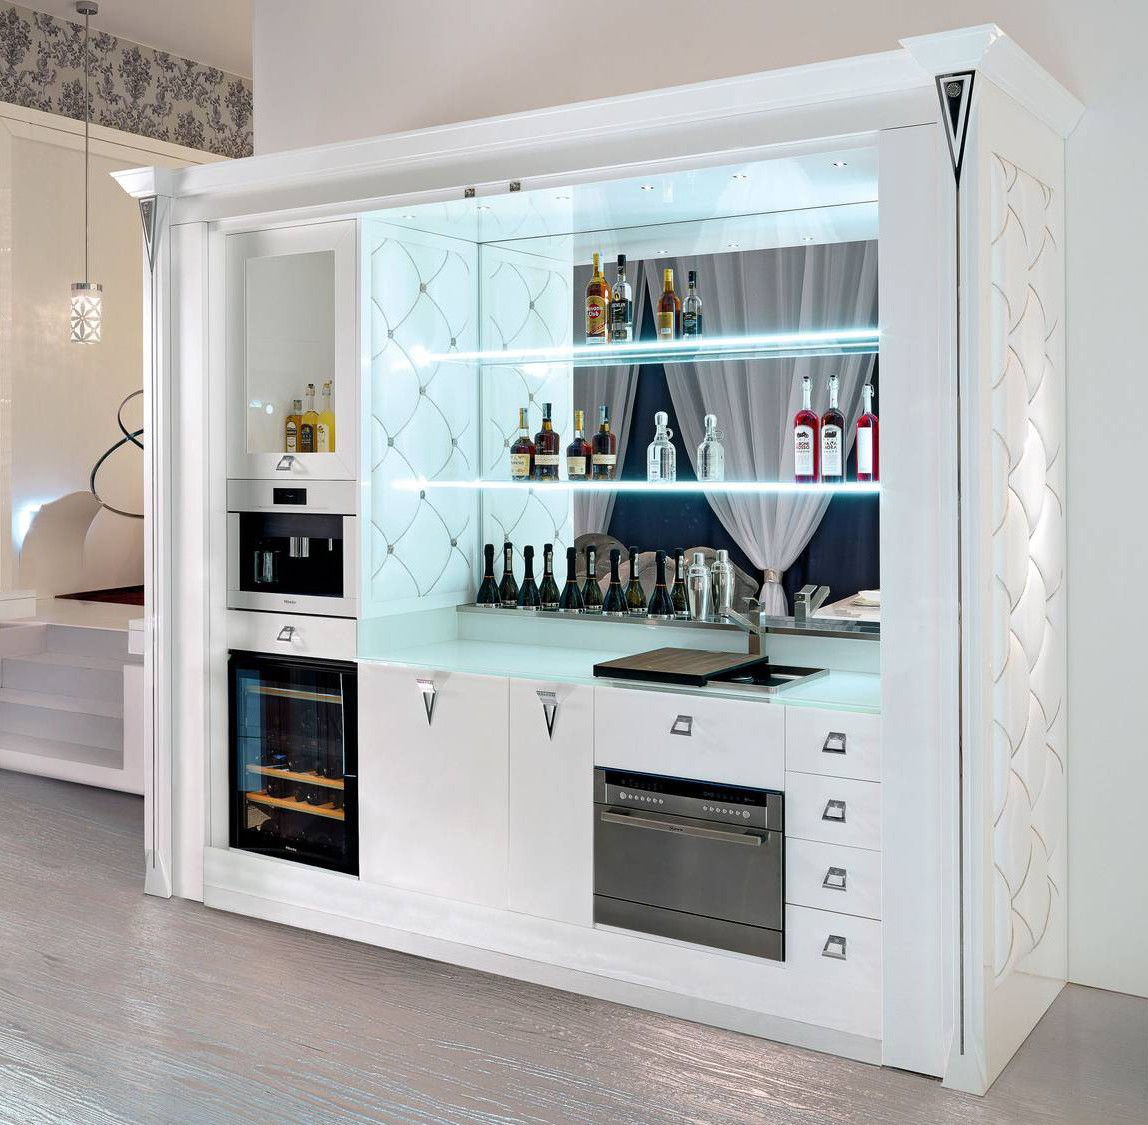 Cantine vino per degustazioni in casa  Ambiente Cucina